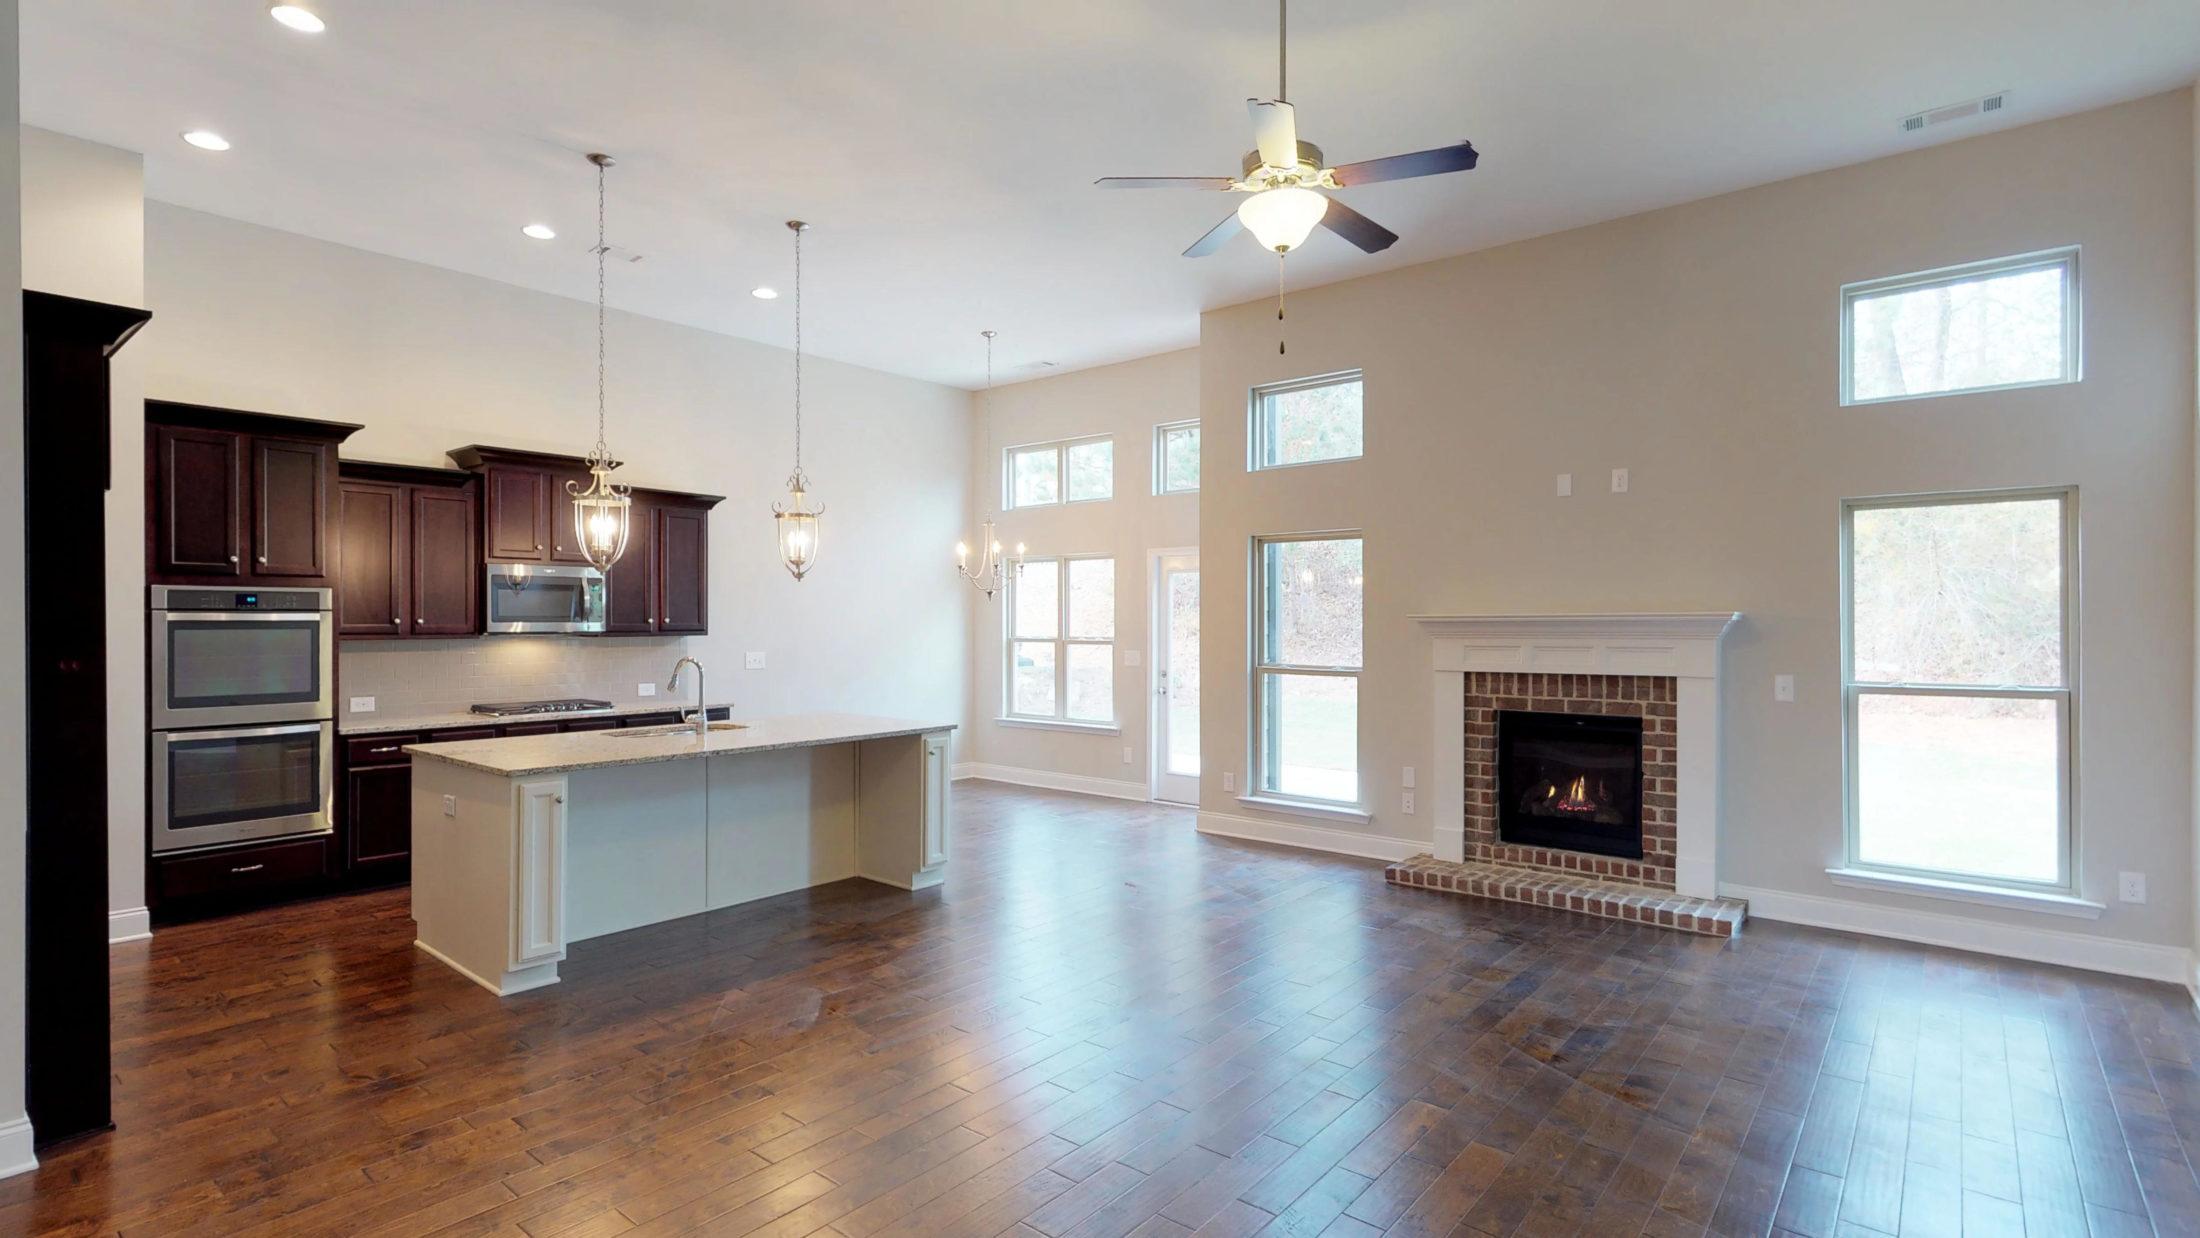 SR Homes: The Ketterton Plan